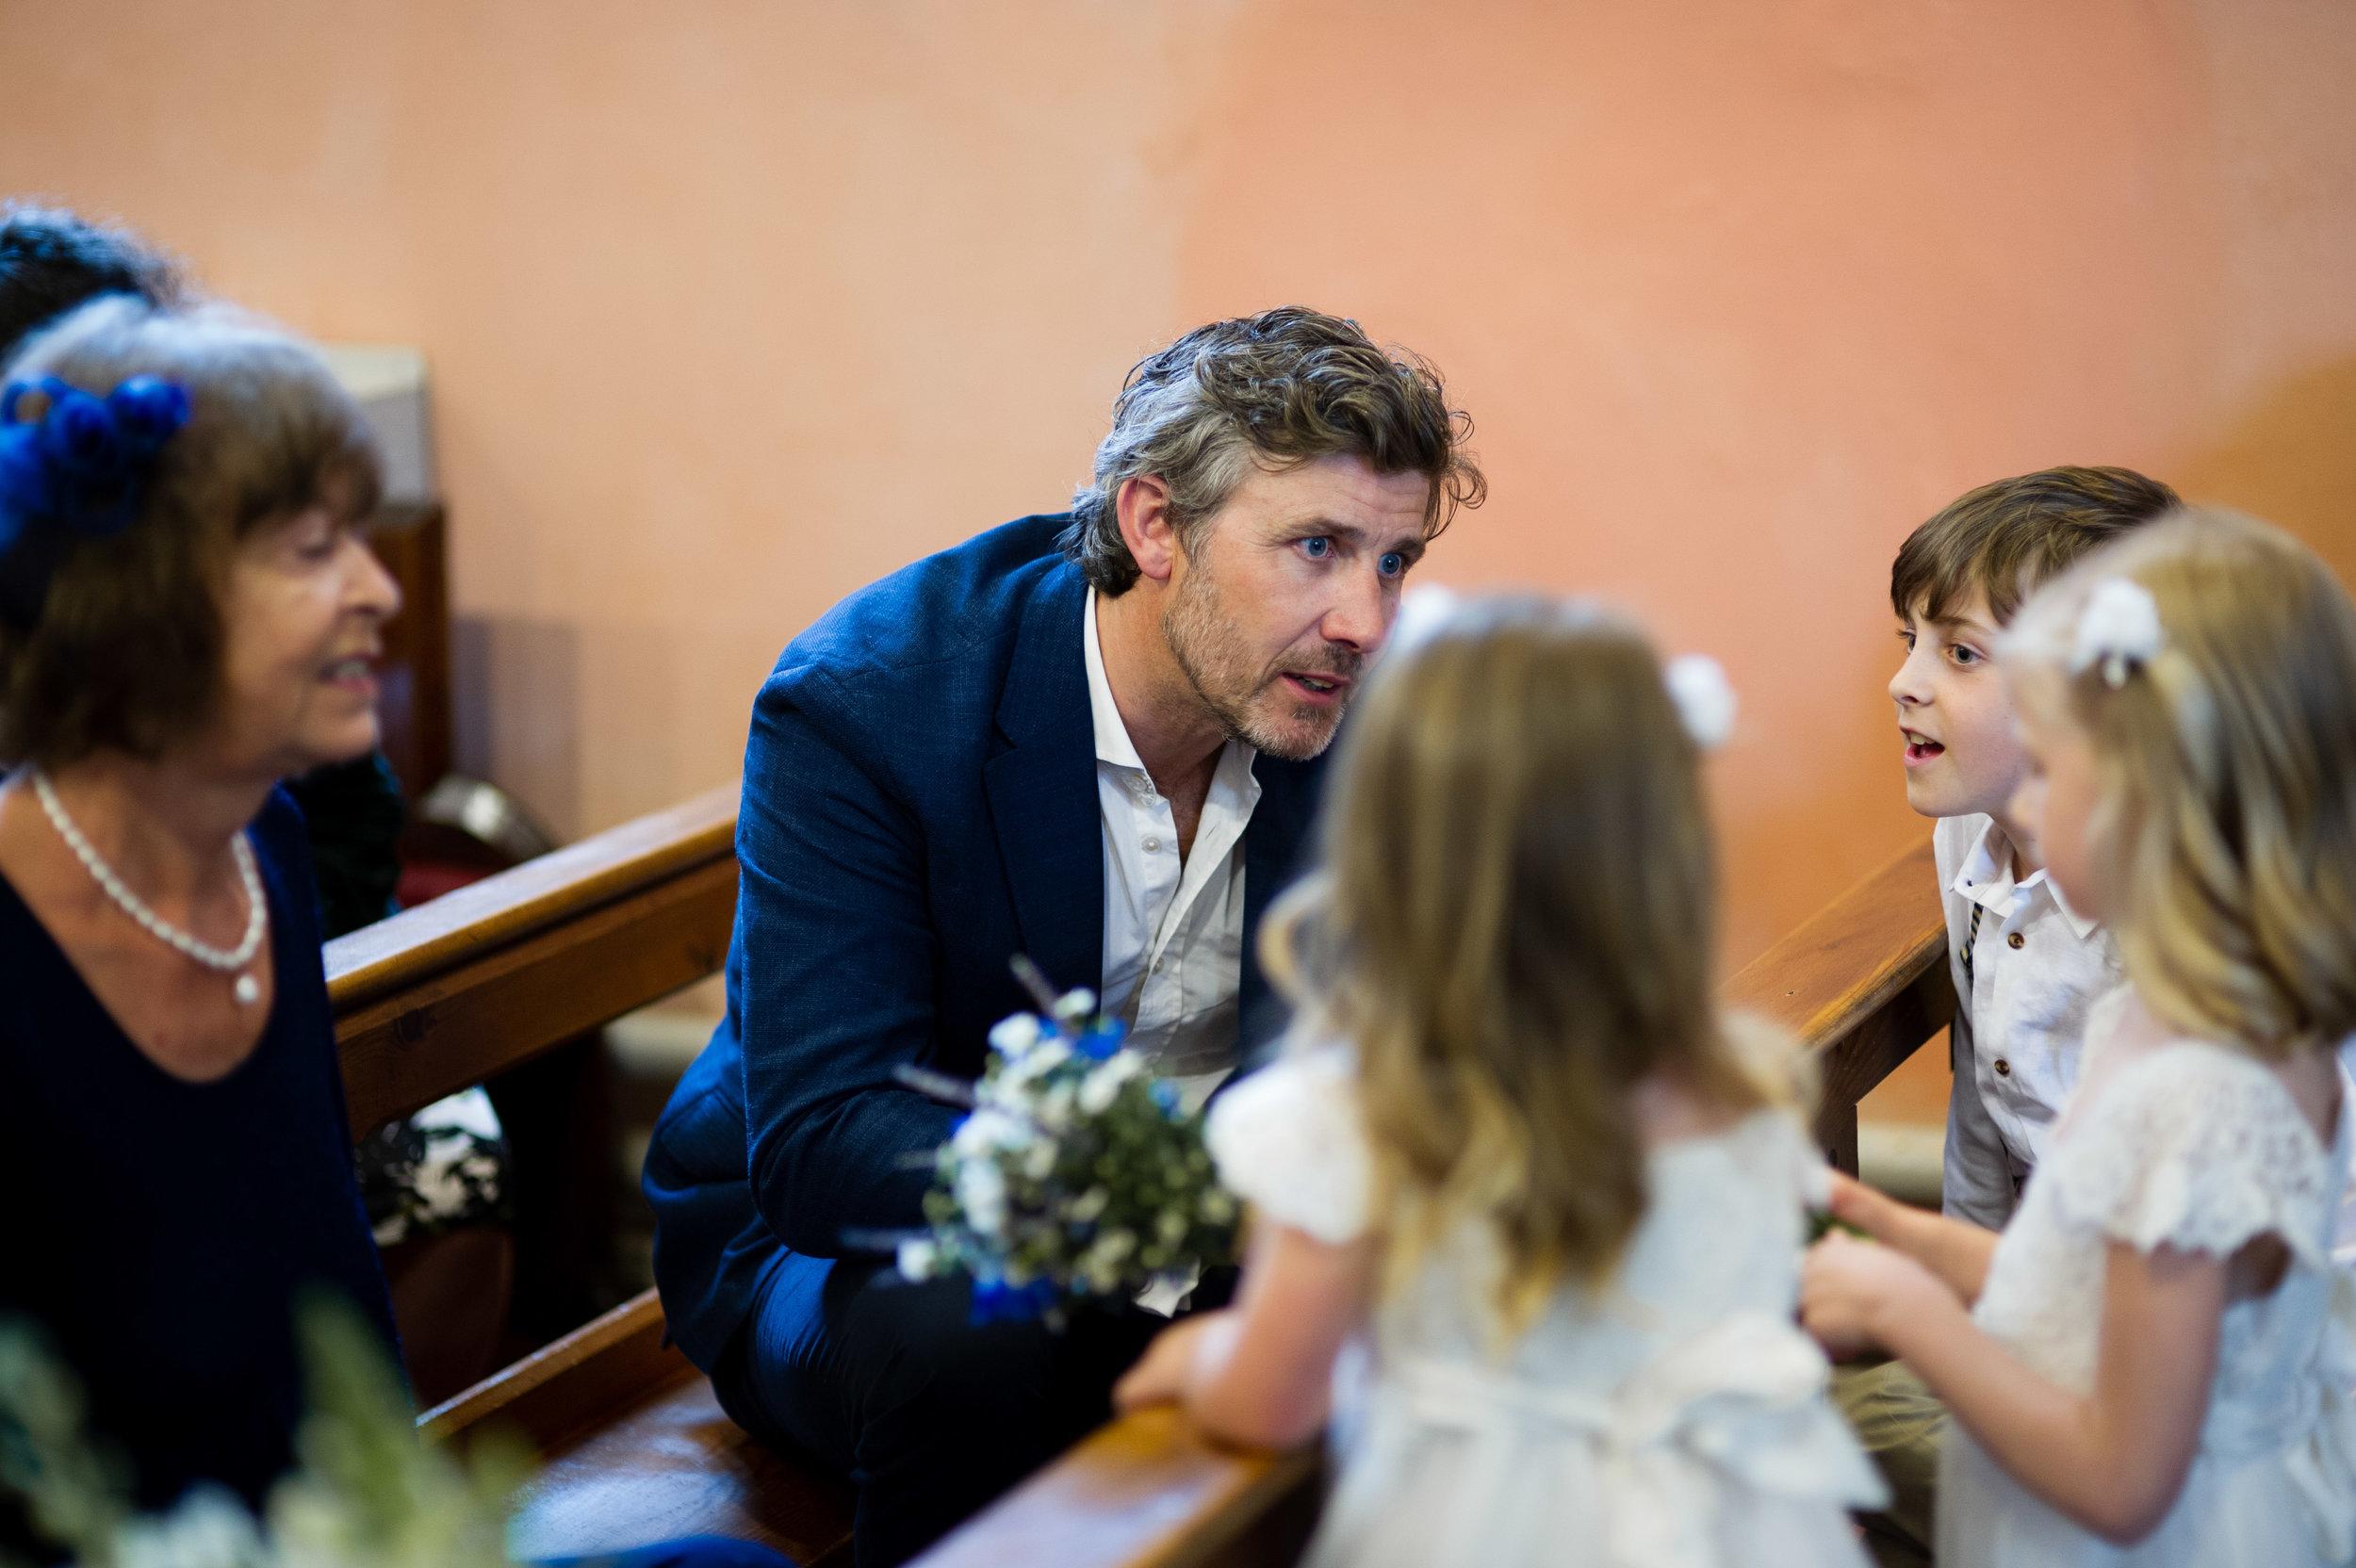 Beechfield house weddings - Abby and Greg (61 of 208).jpg